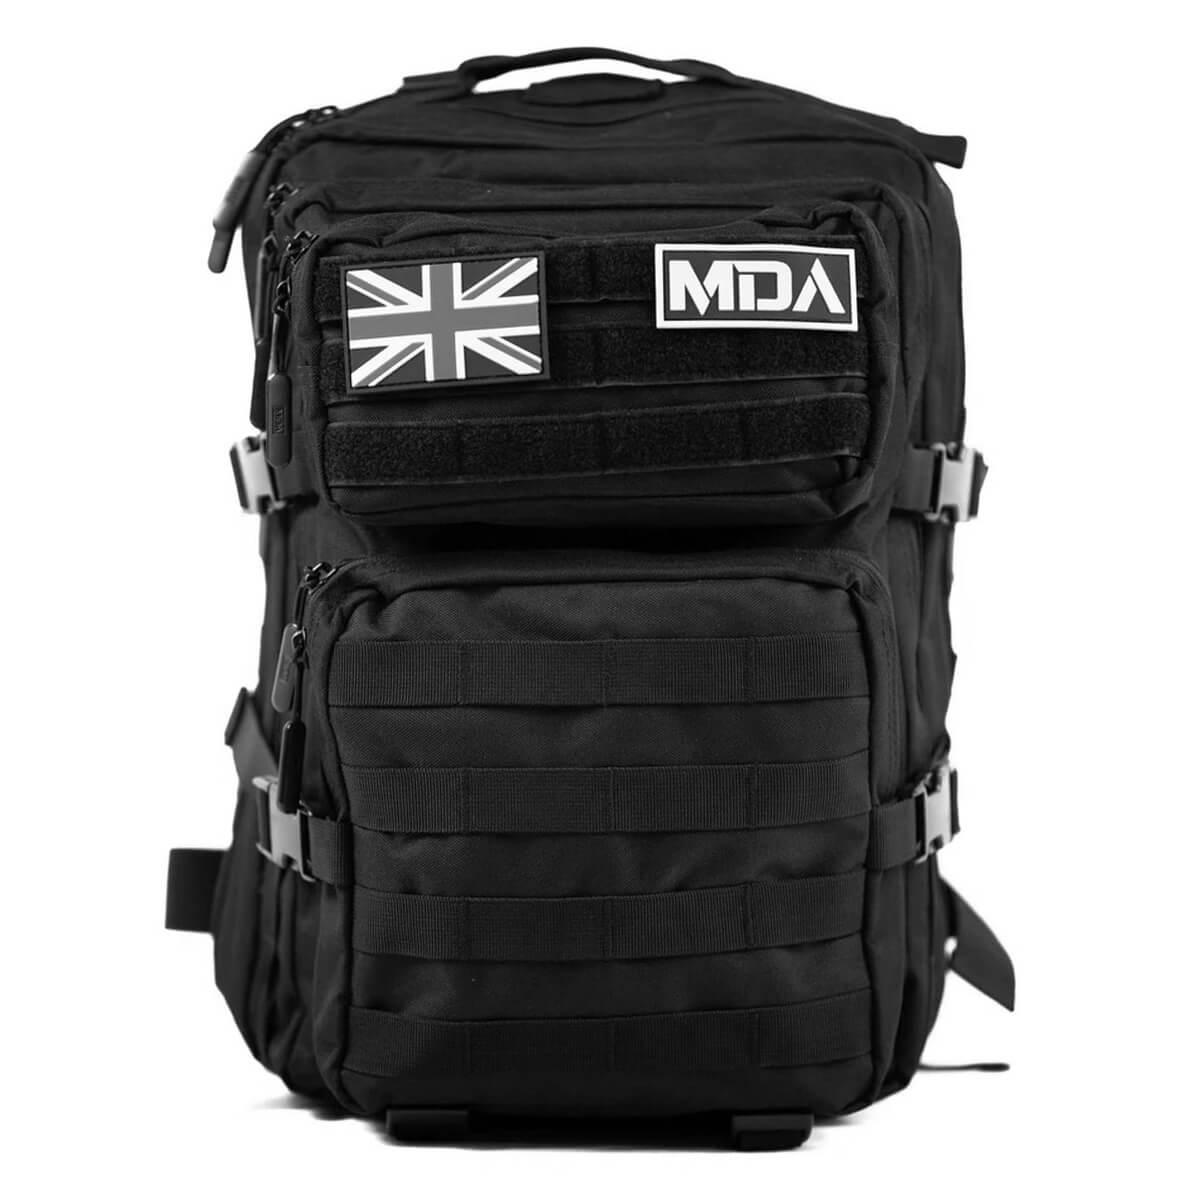 thumbnail 5 - Modern Day Athlete Unisex 2021 MD25 Waterproof Gym Training Backpack Rucksack